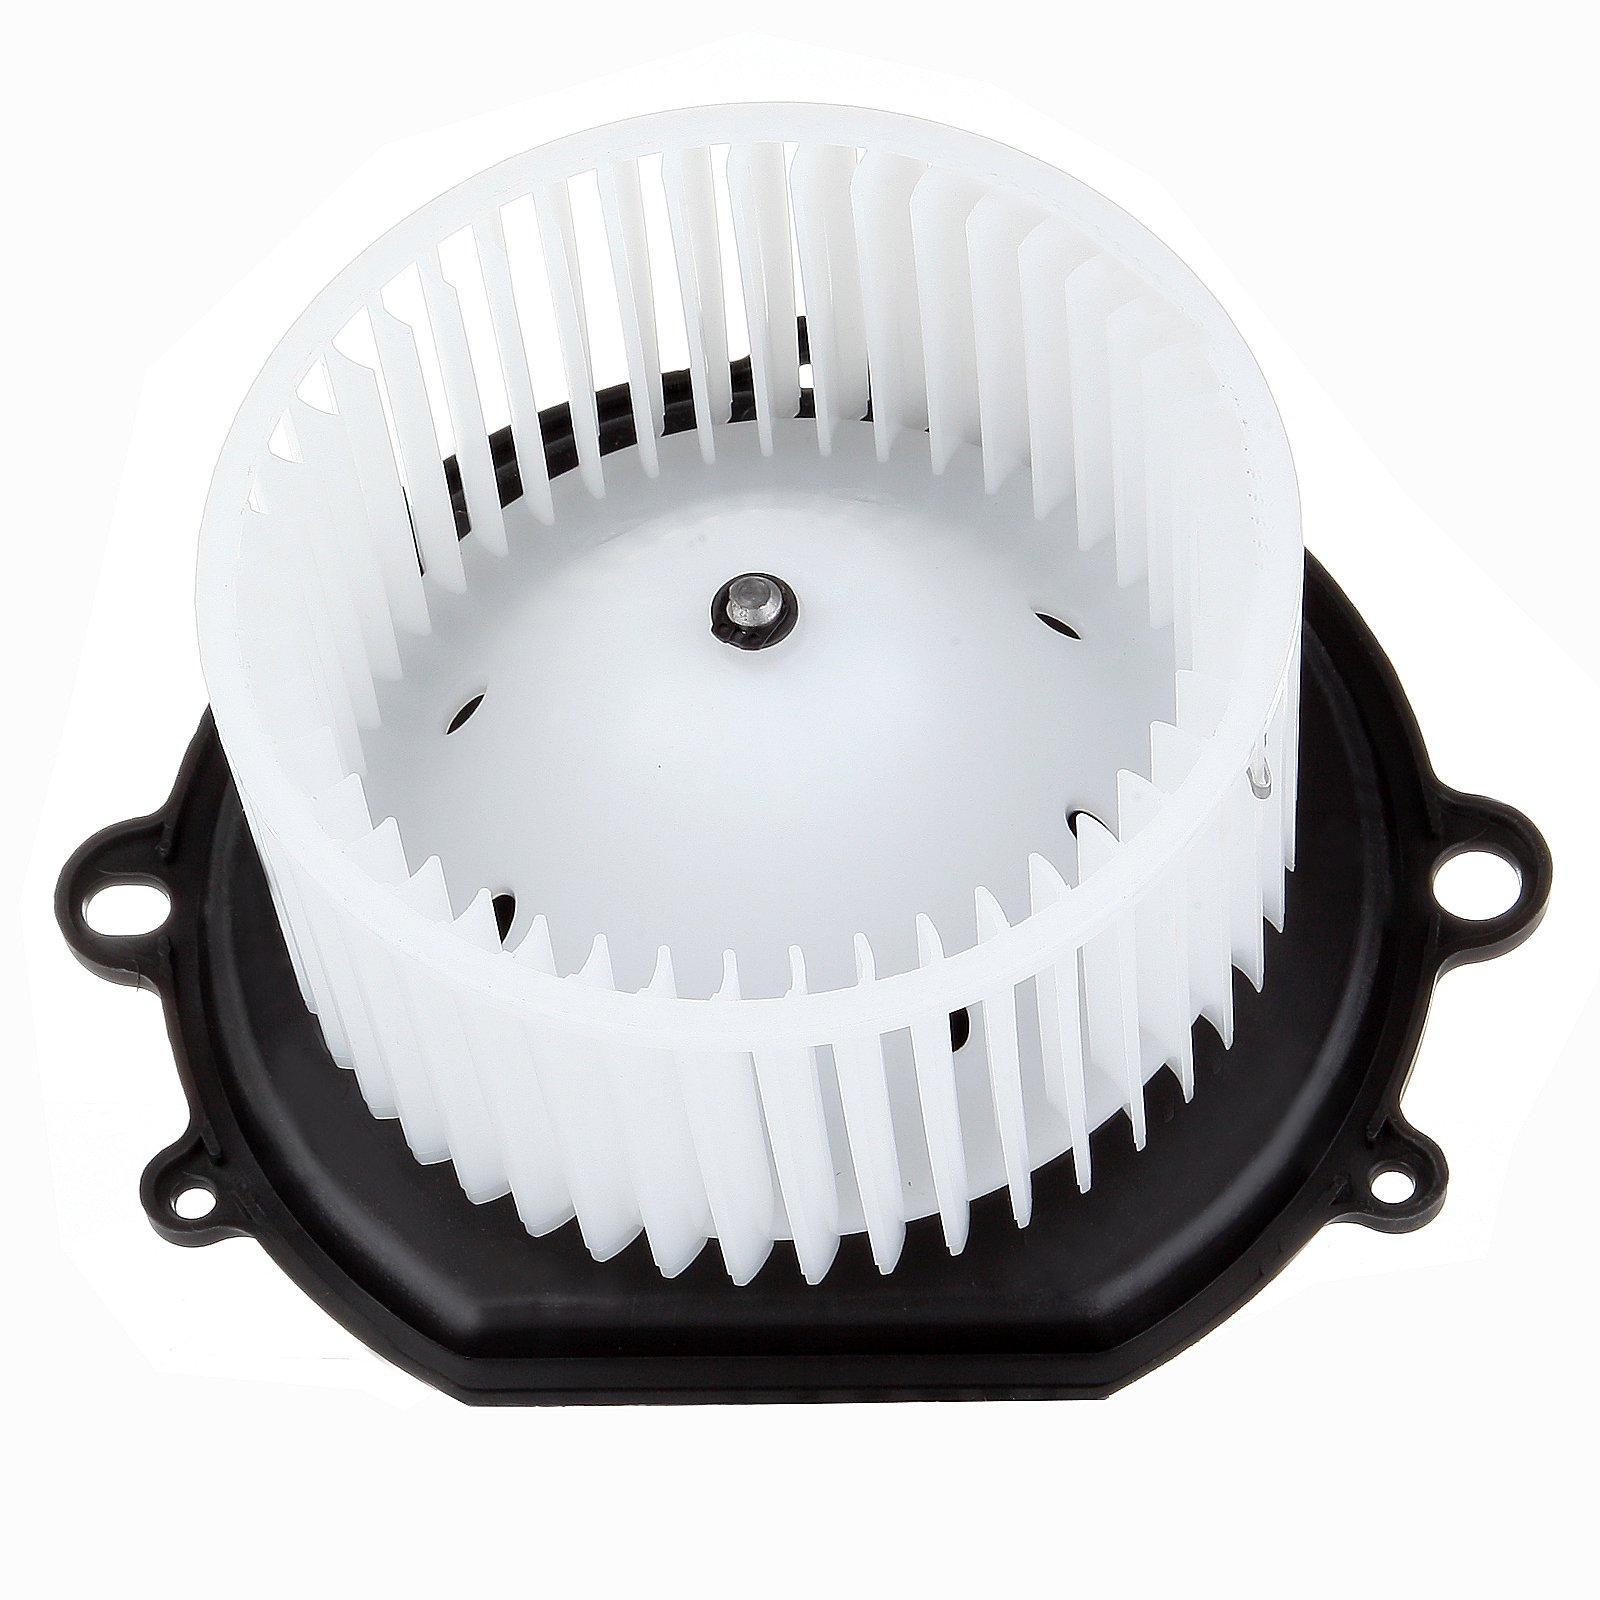 SCITOO ABS plastic Heater Blower Motor w/Fan HVAC Resistors Blowers Motors fit 1996-2007 Ford Taurus 1996-2005 Mercury Sable